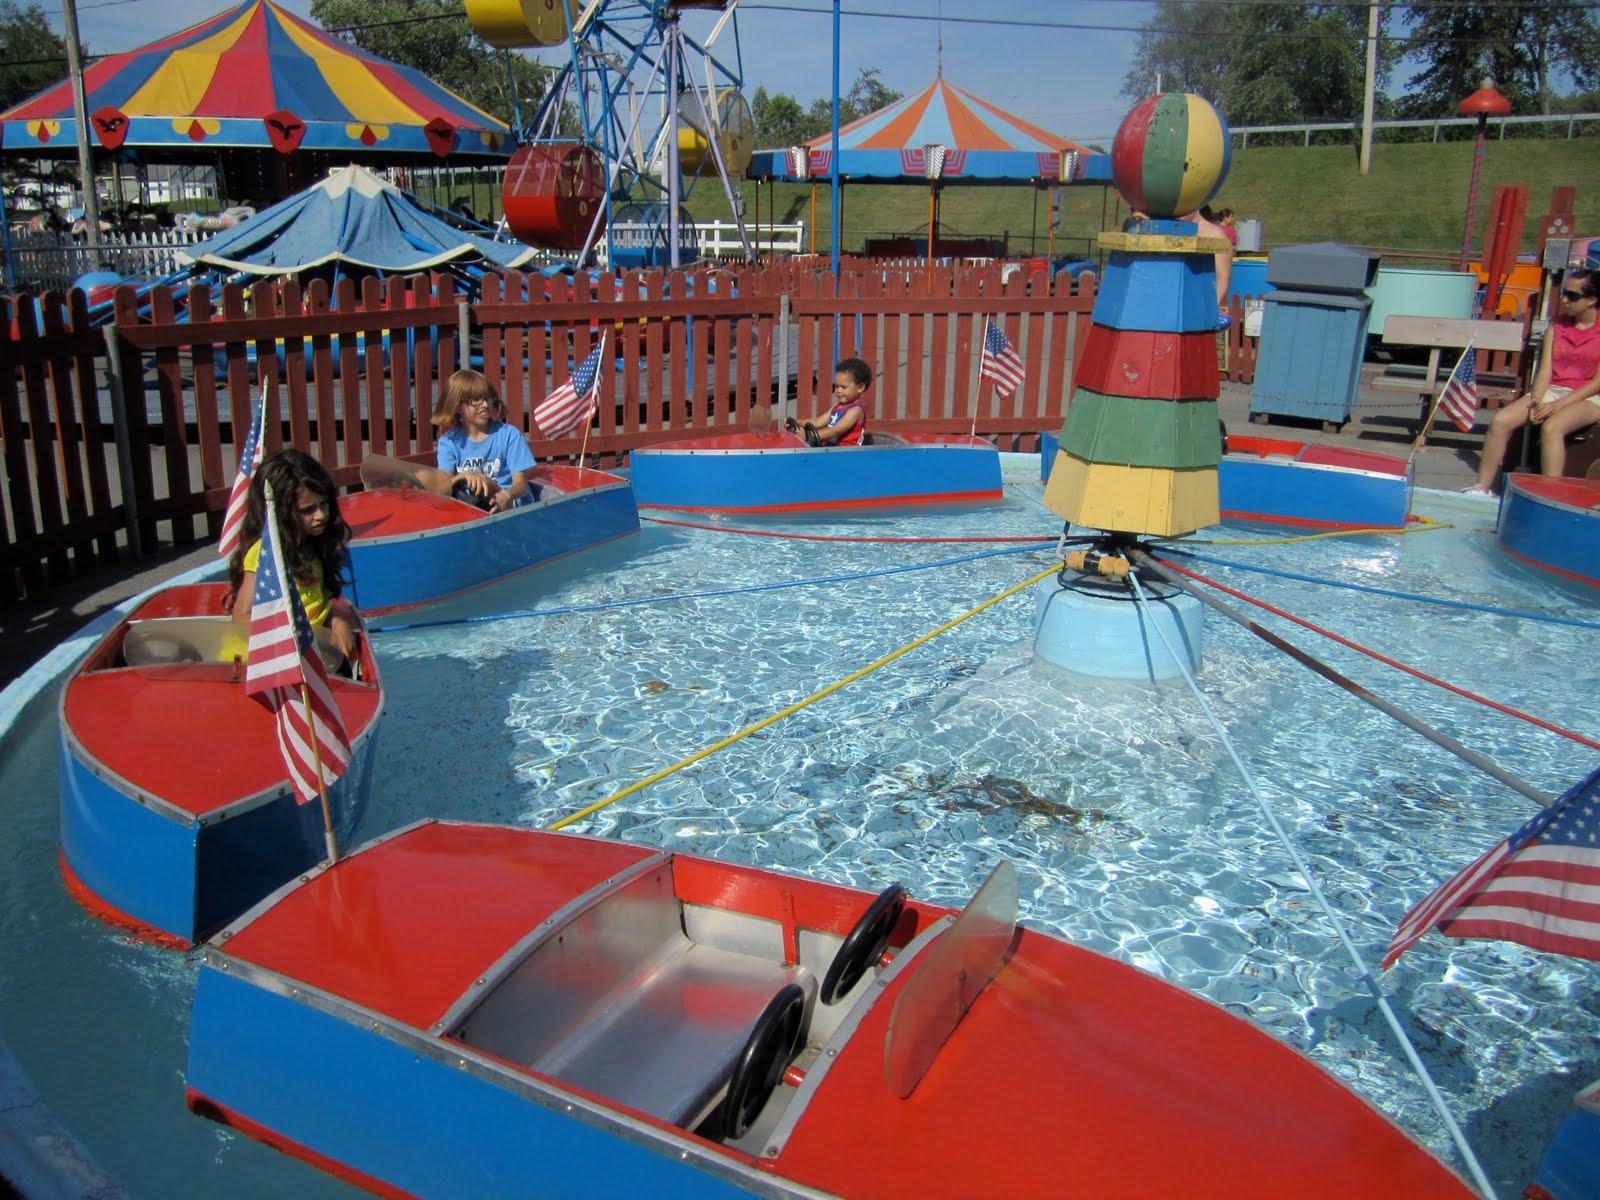 old school amusement parks sylvan beach ny